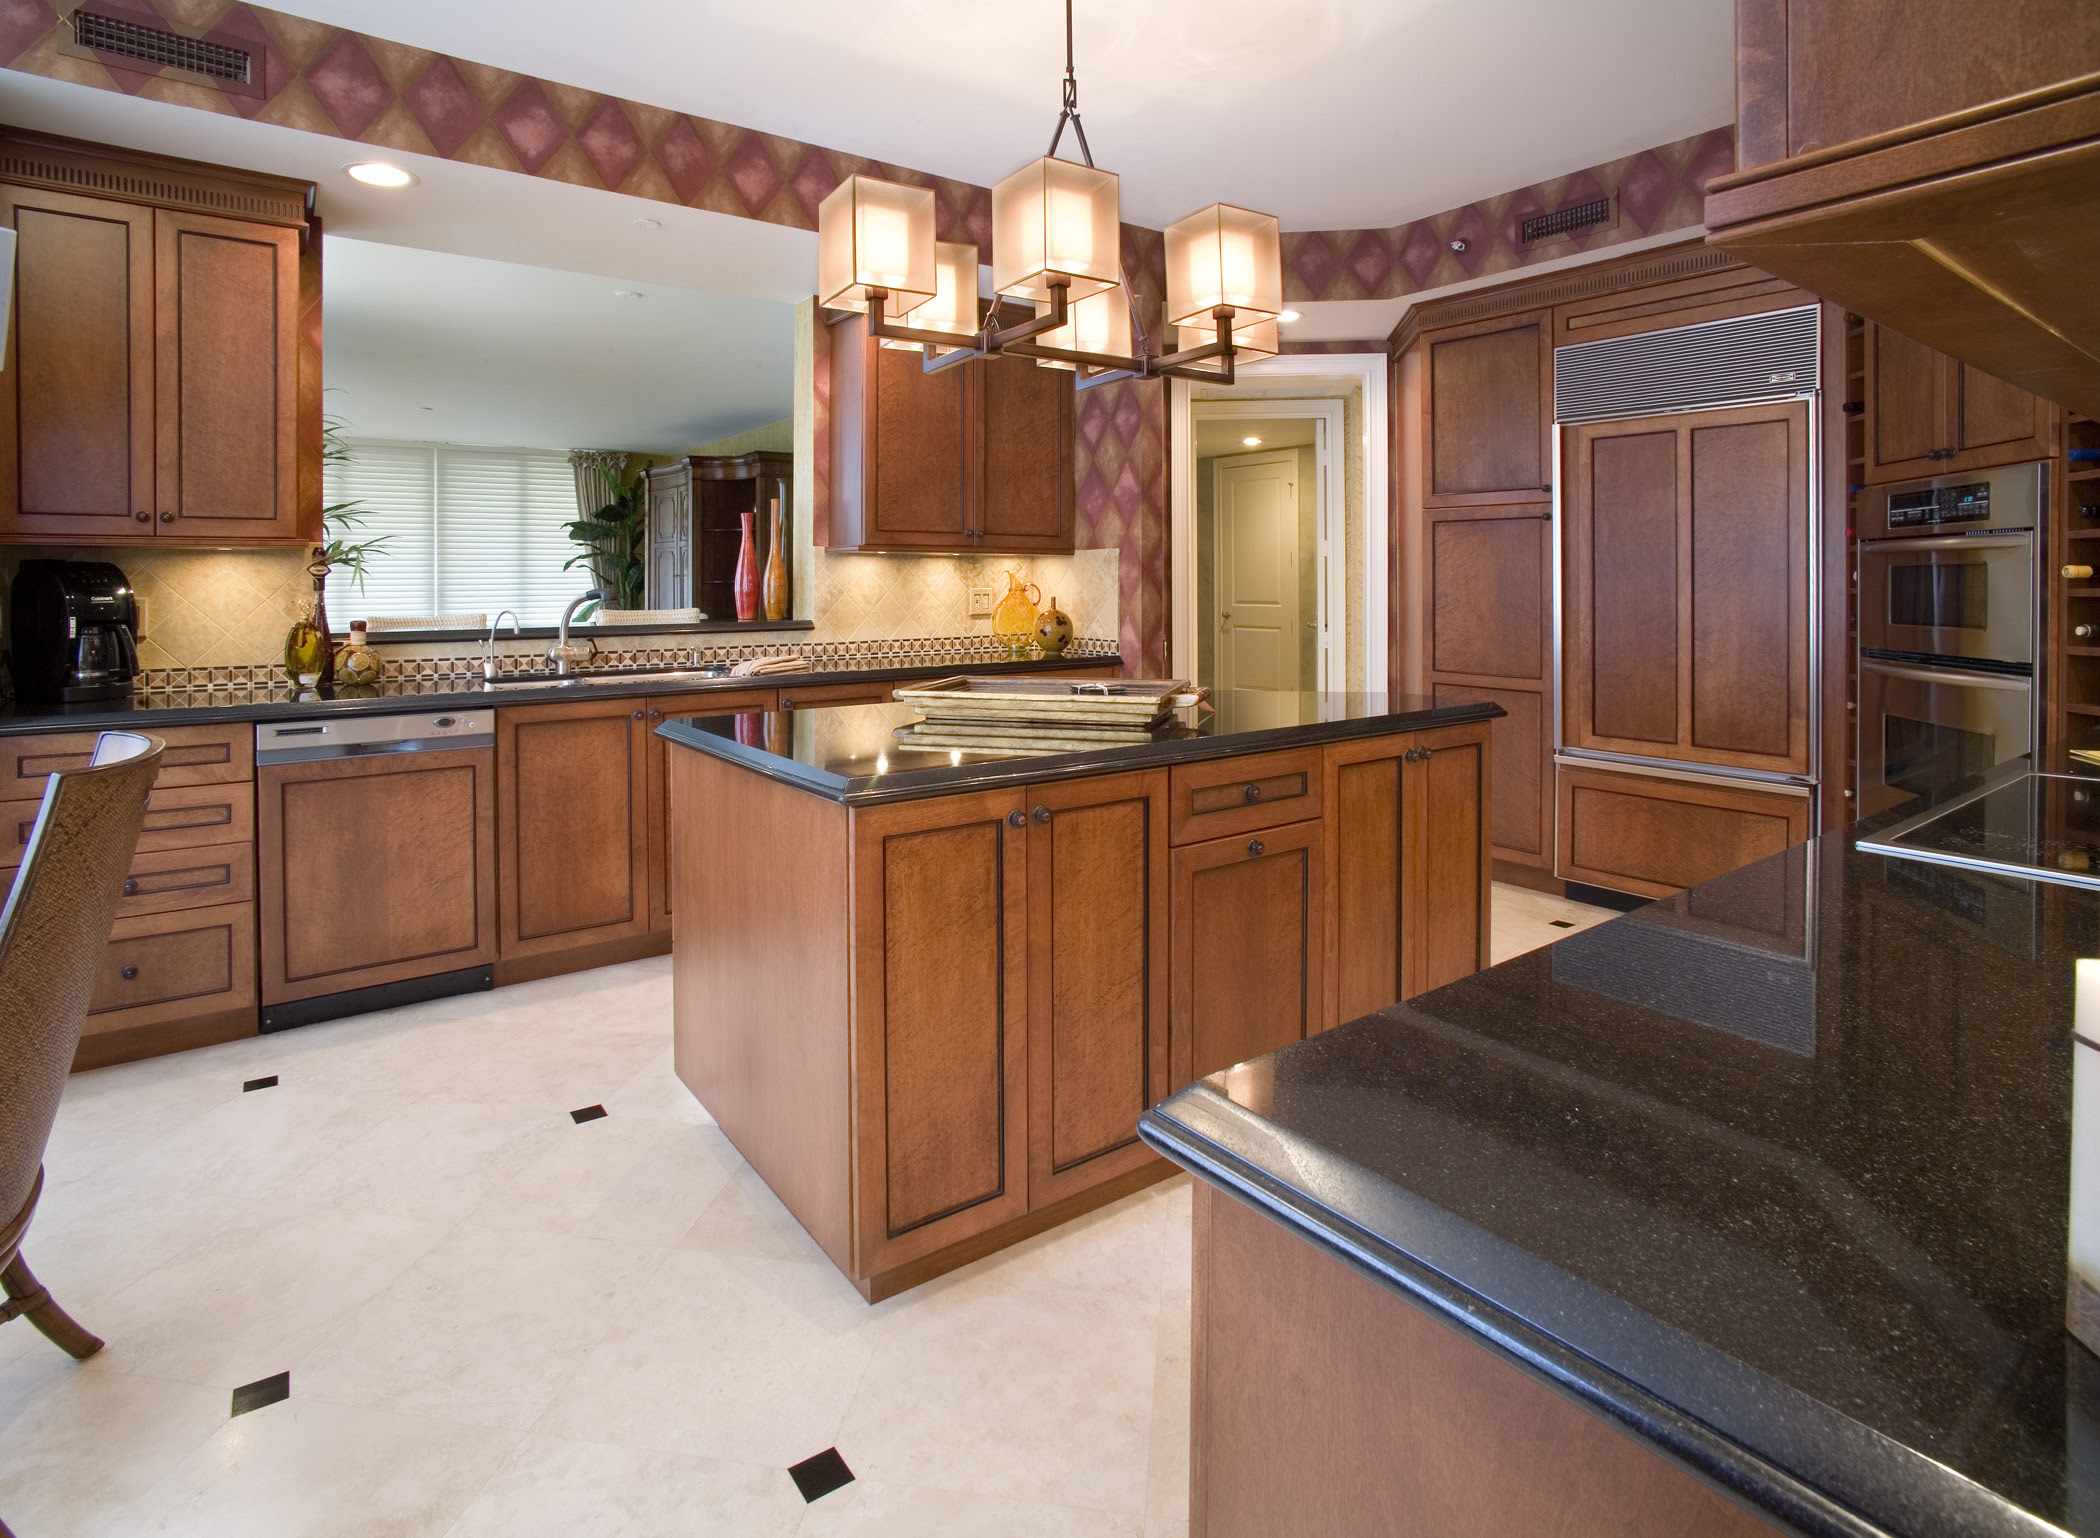 Patete Kitchen Design Inspiration The Most New House Furniture Ideas